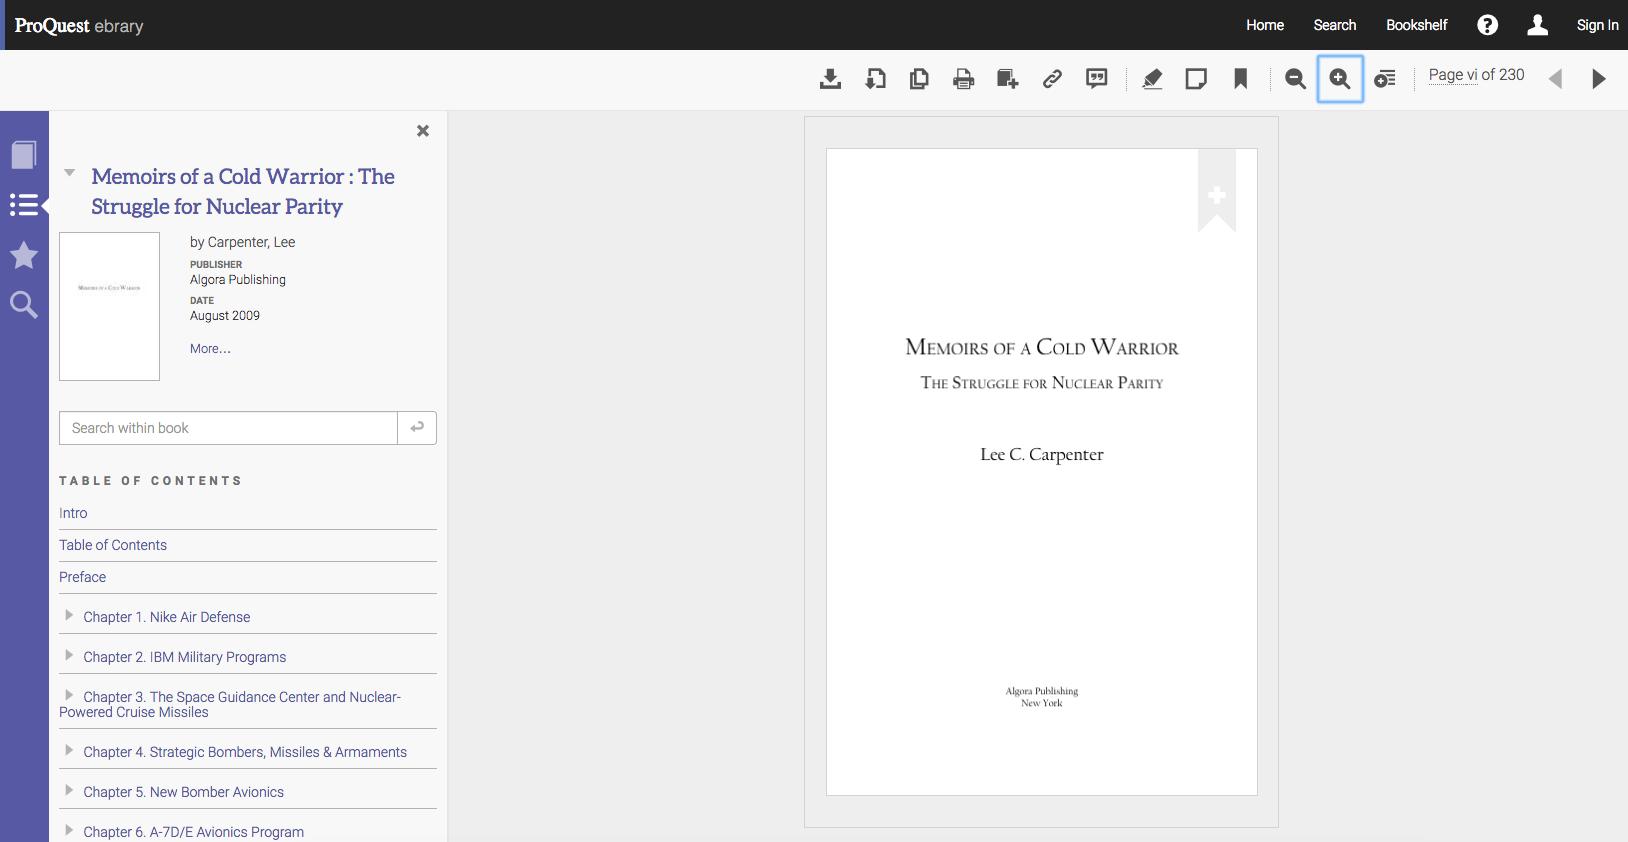 Screenshot of an e-book accessed through Ebook Central